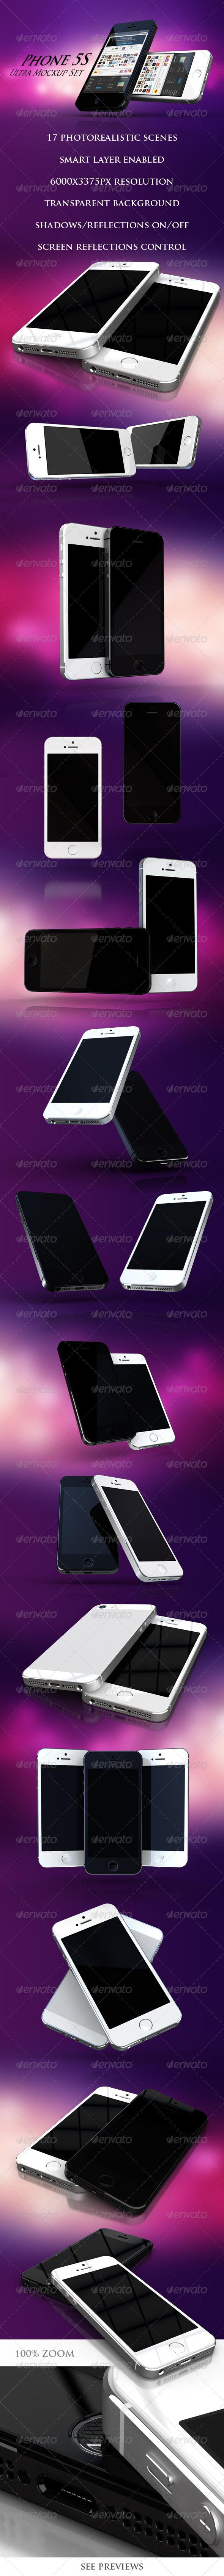 GraphicRiver Phone 5S Ultra Mockup Set 6572381